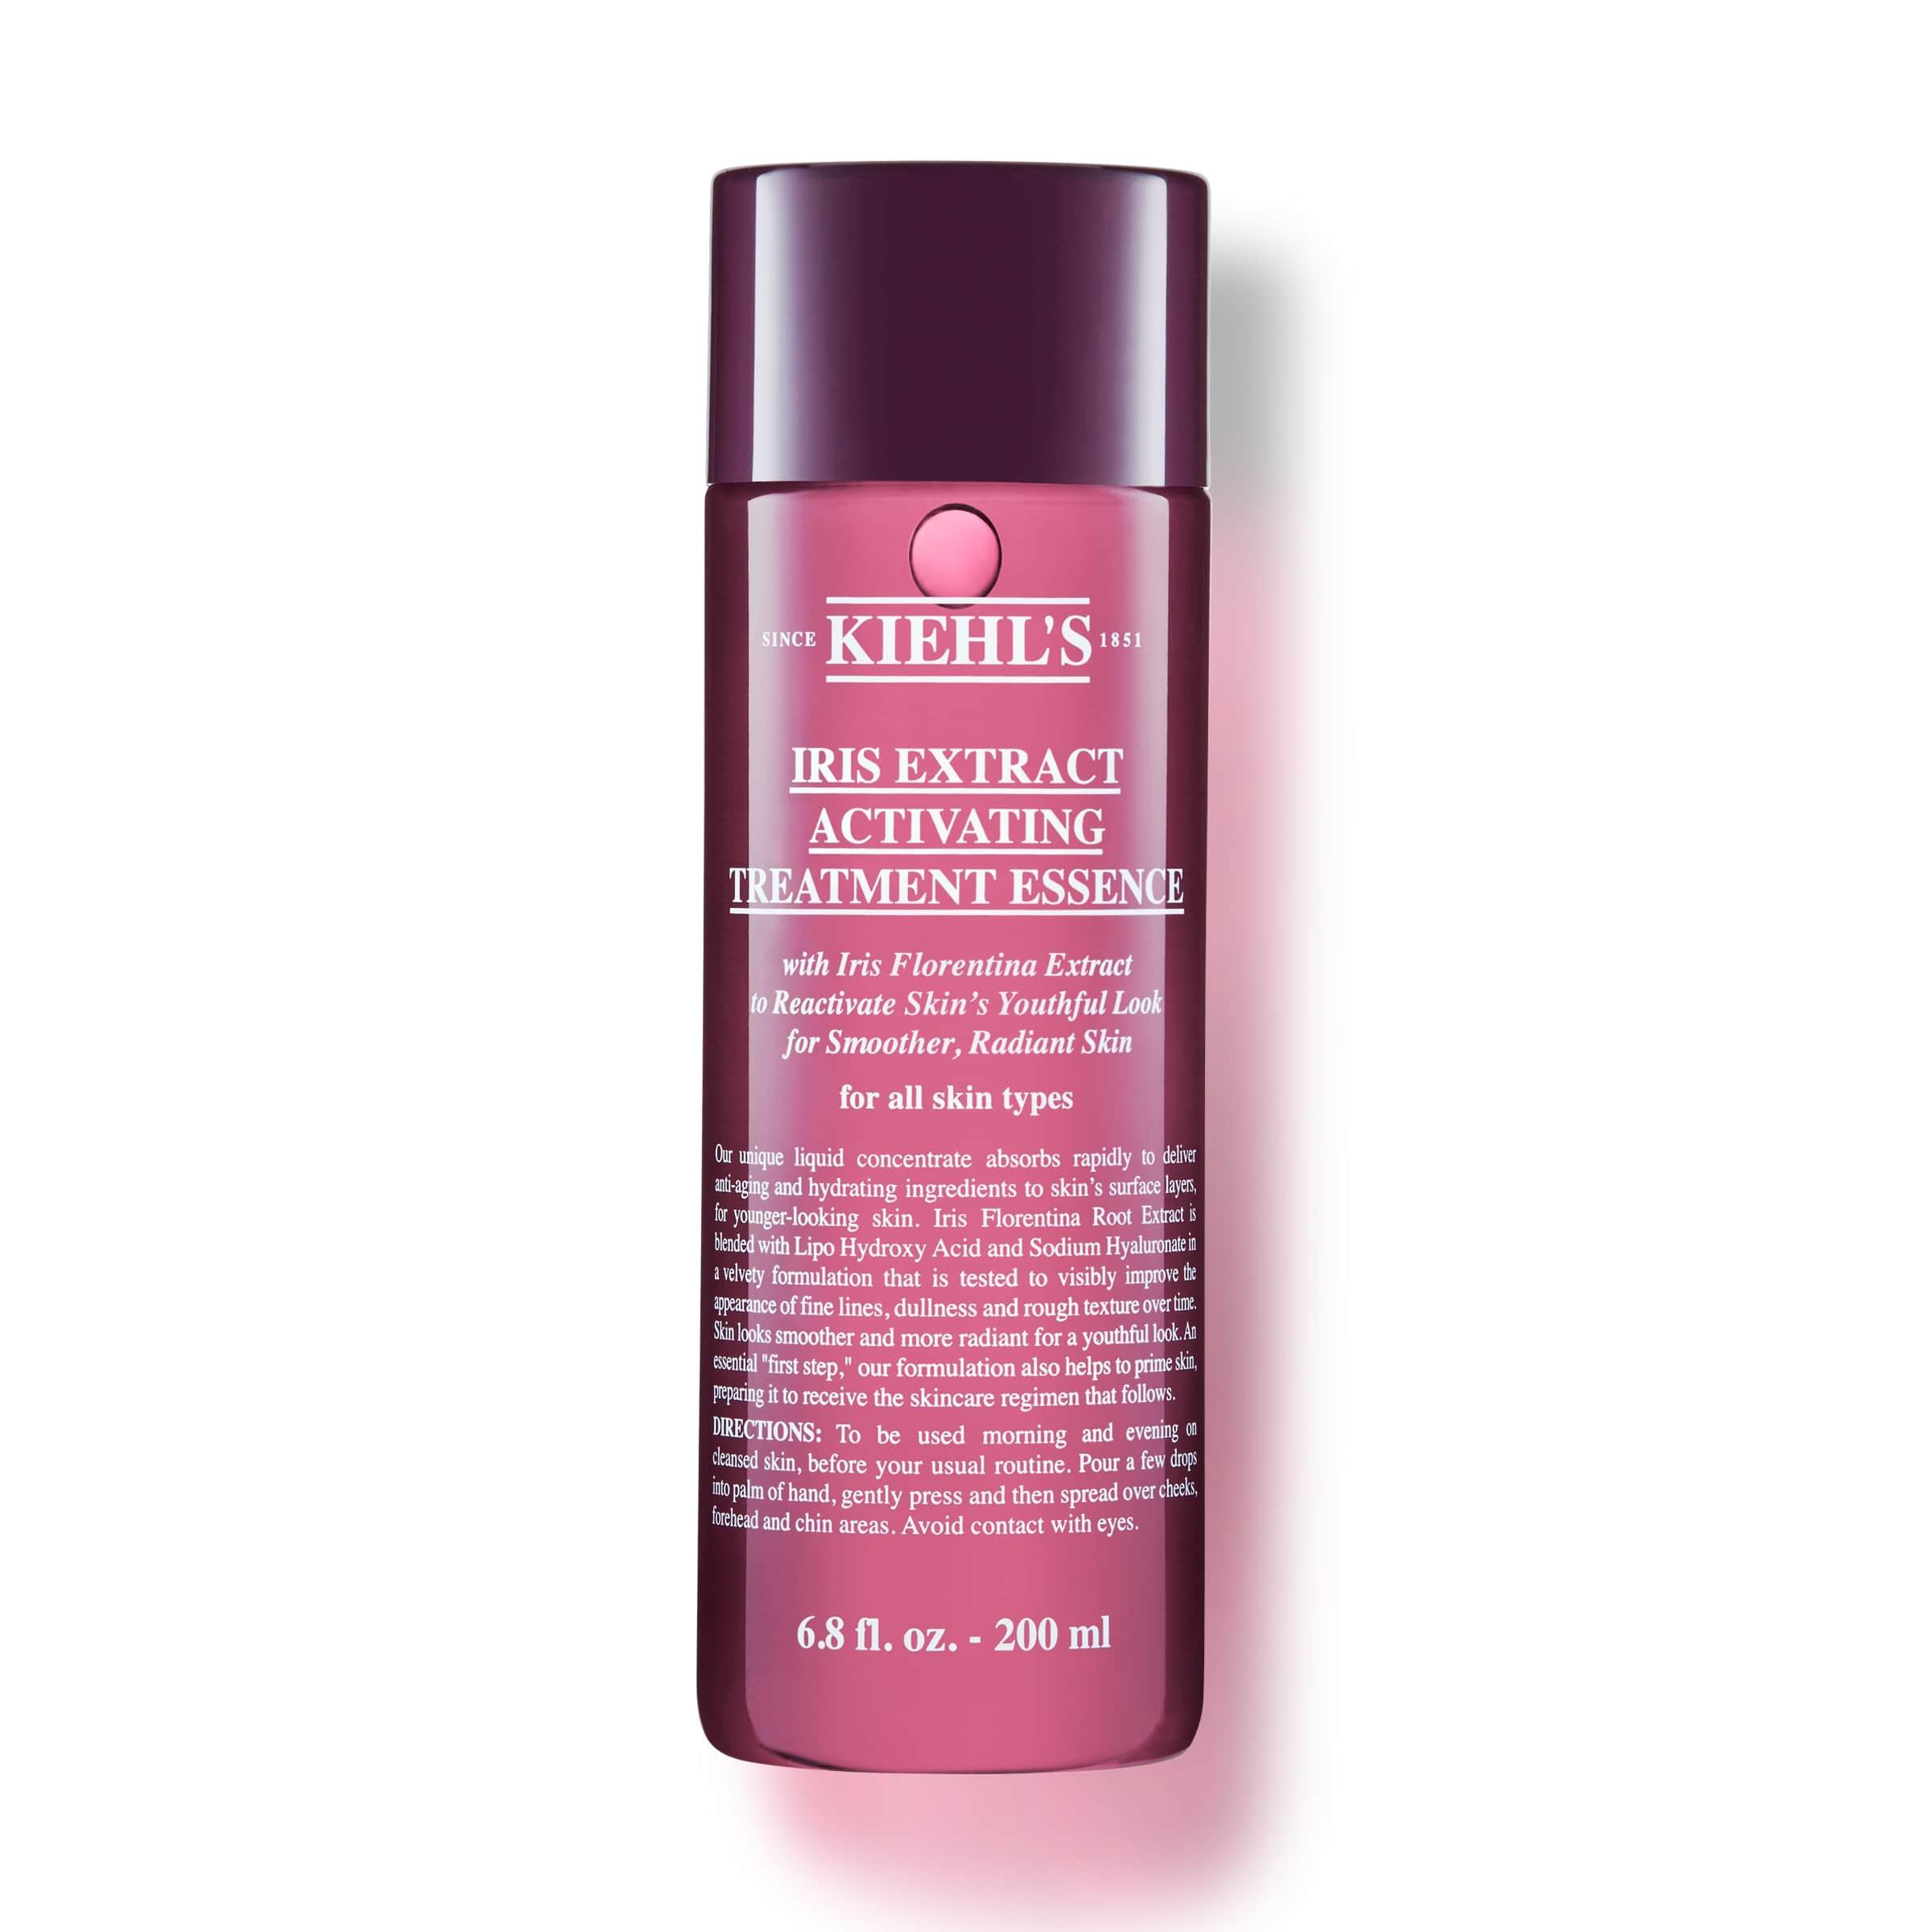 Kiehls-Iris-Extract-Activating-Essence-Treatment